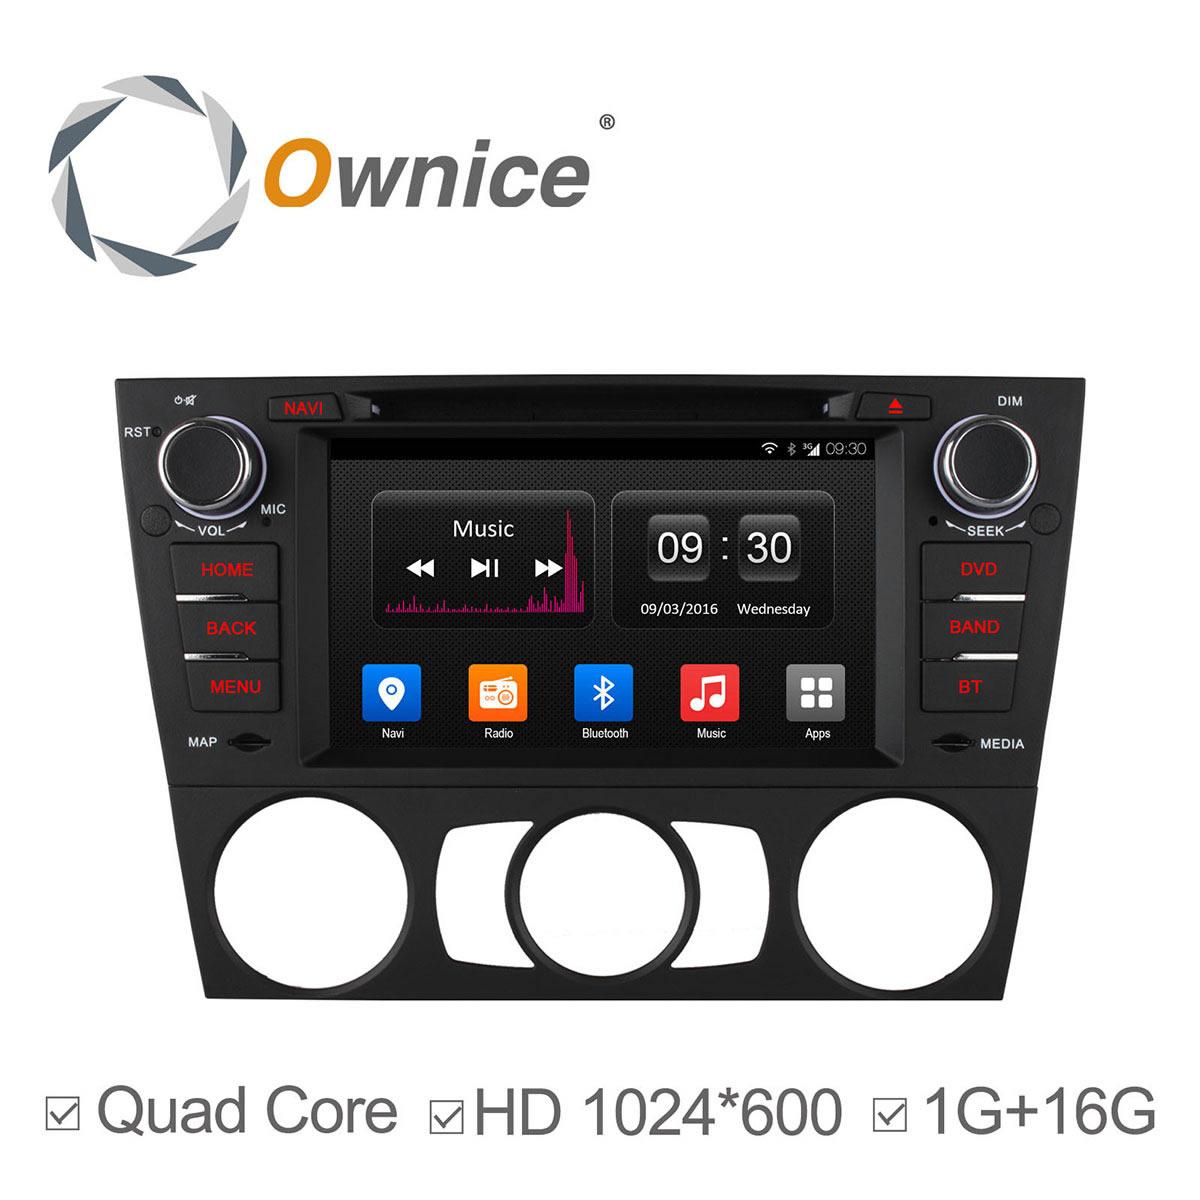 Android 44 4 Core 1024600 Car Stereo For Bmw E90 E91 E92 E93 Wifi